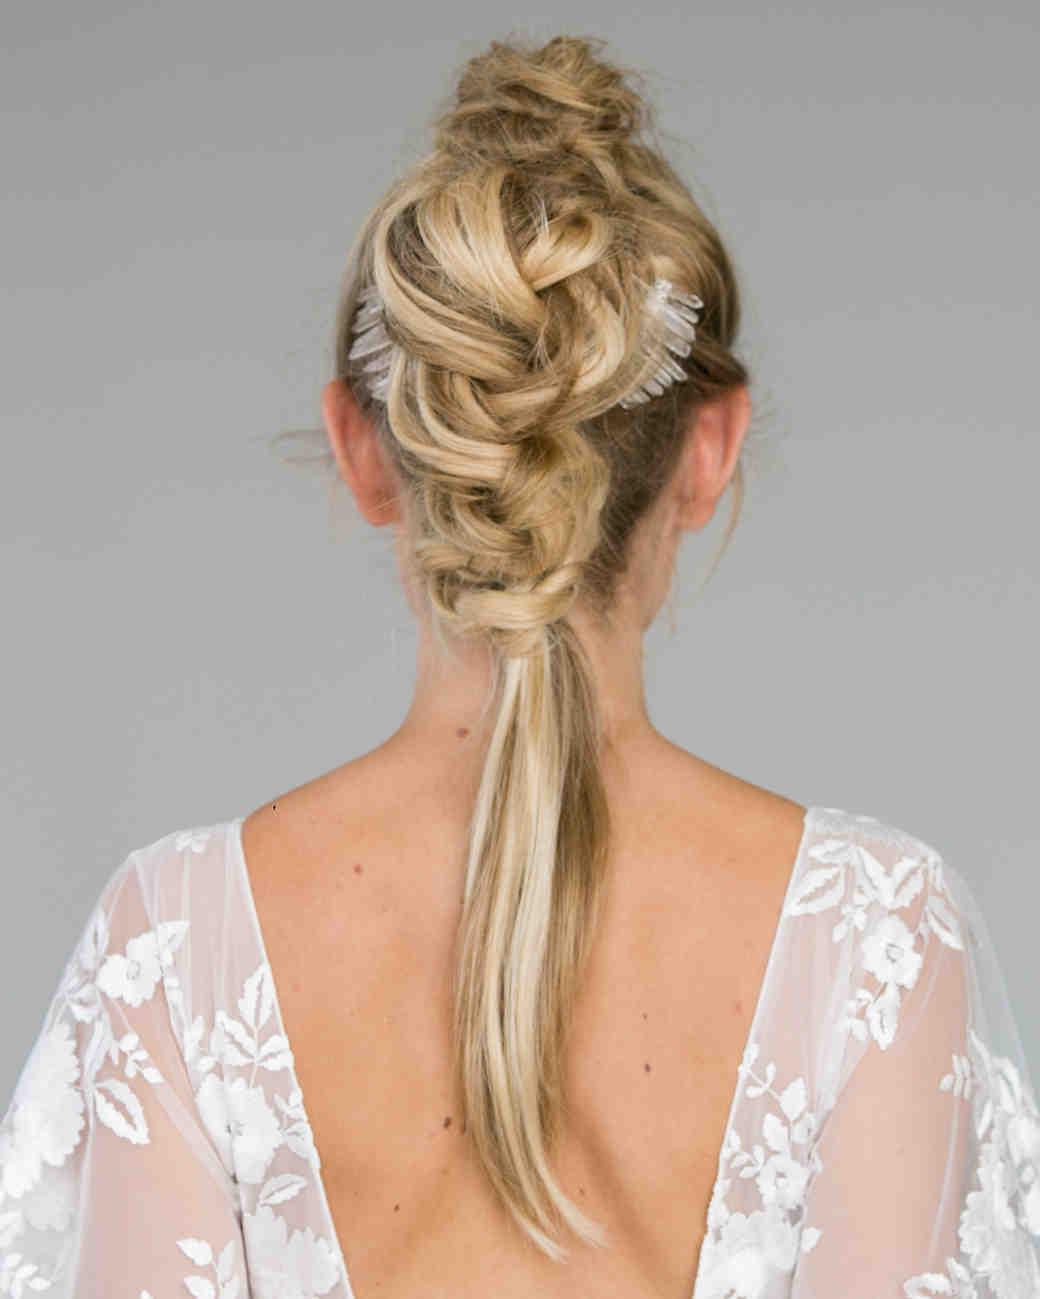 rime-arodaky-fall-2017-wedding-hairstyle-look-2-back-1016